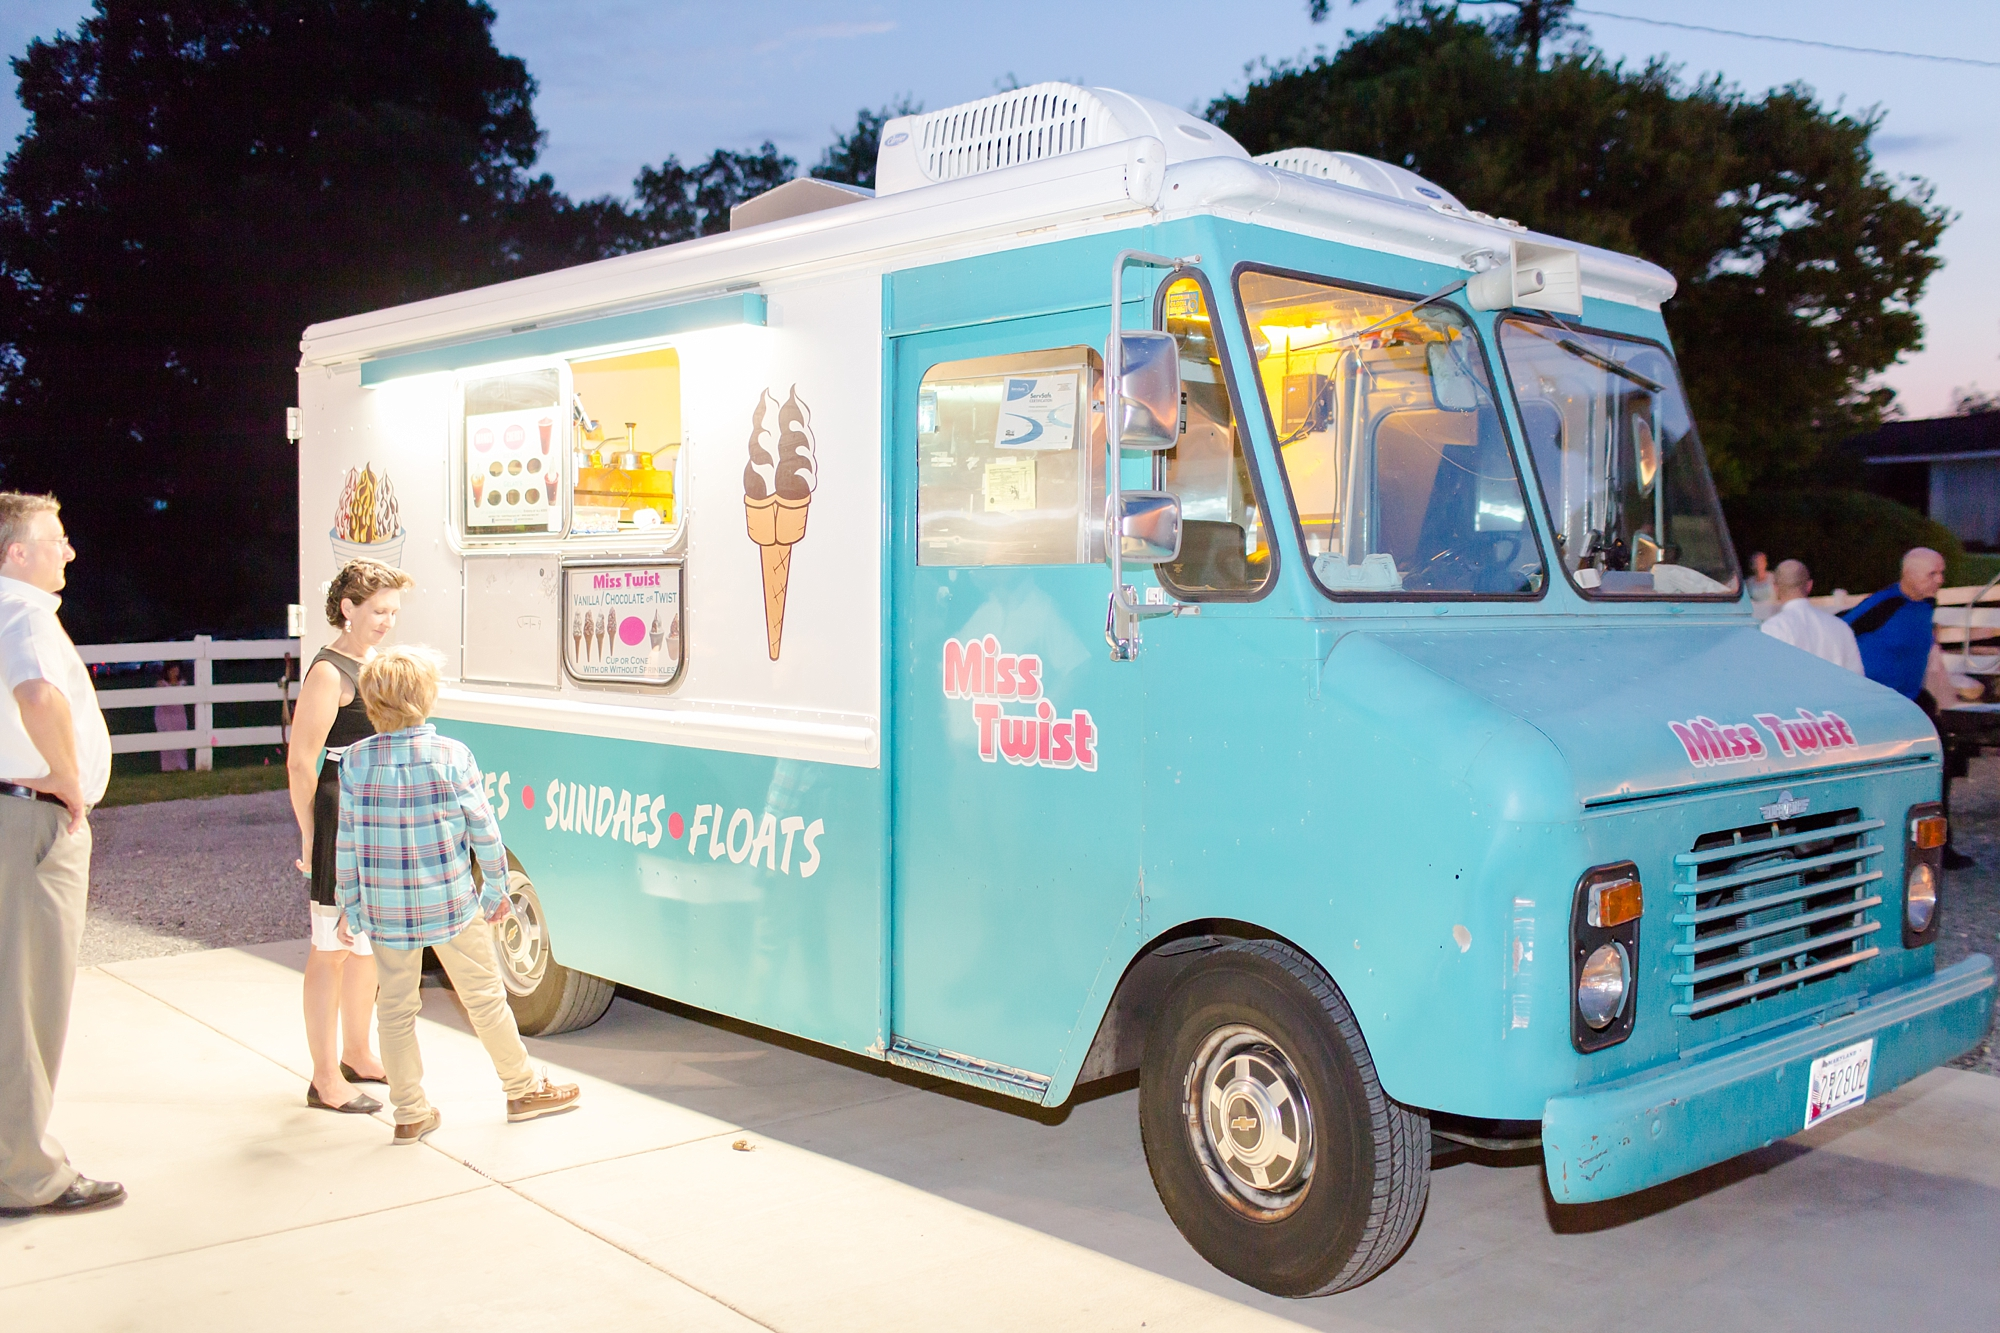 They had Mrs. Twist ice cream truck come for dessert!